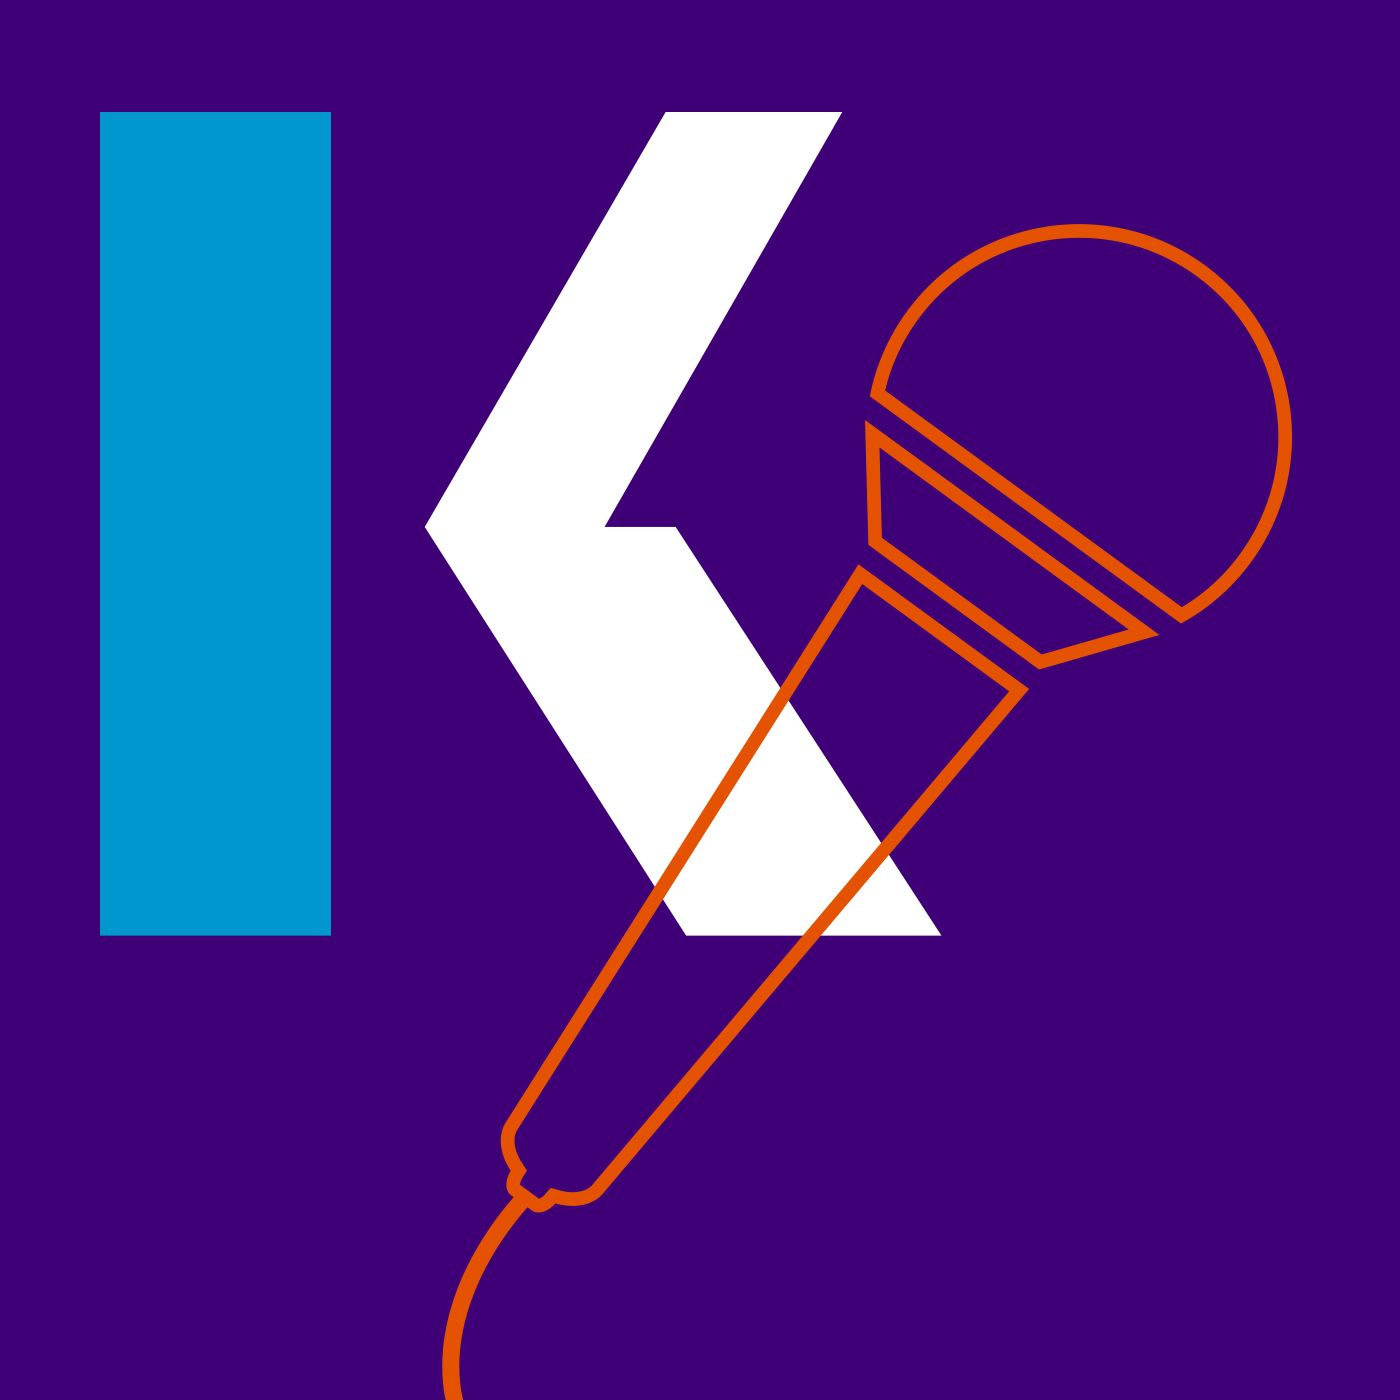 Kaplan's NCLEX Prepcast - Episode 33 - 7 habits of highly effective NCLEX® prep